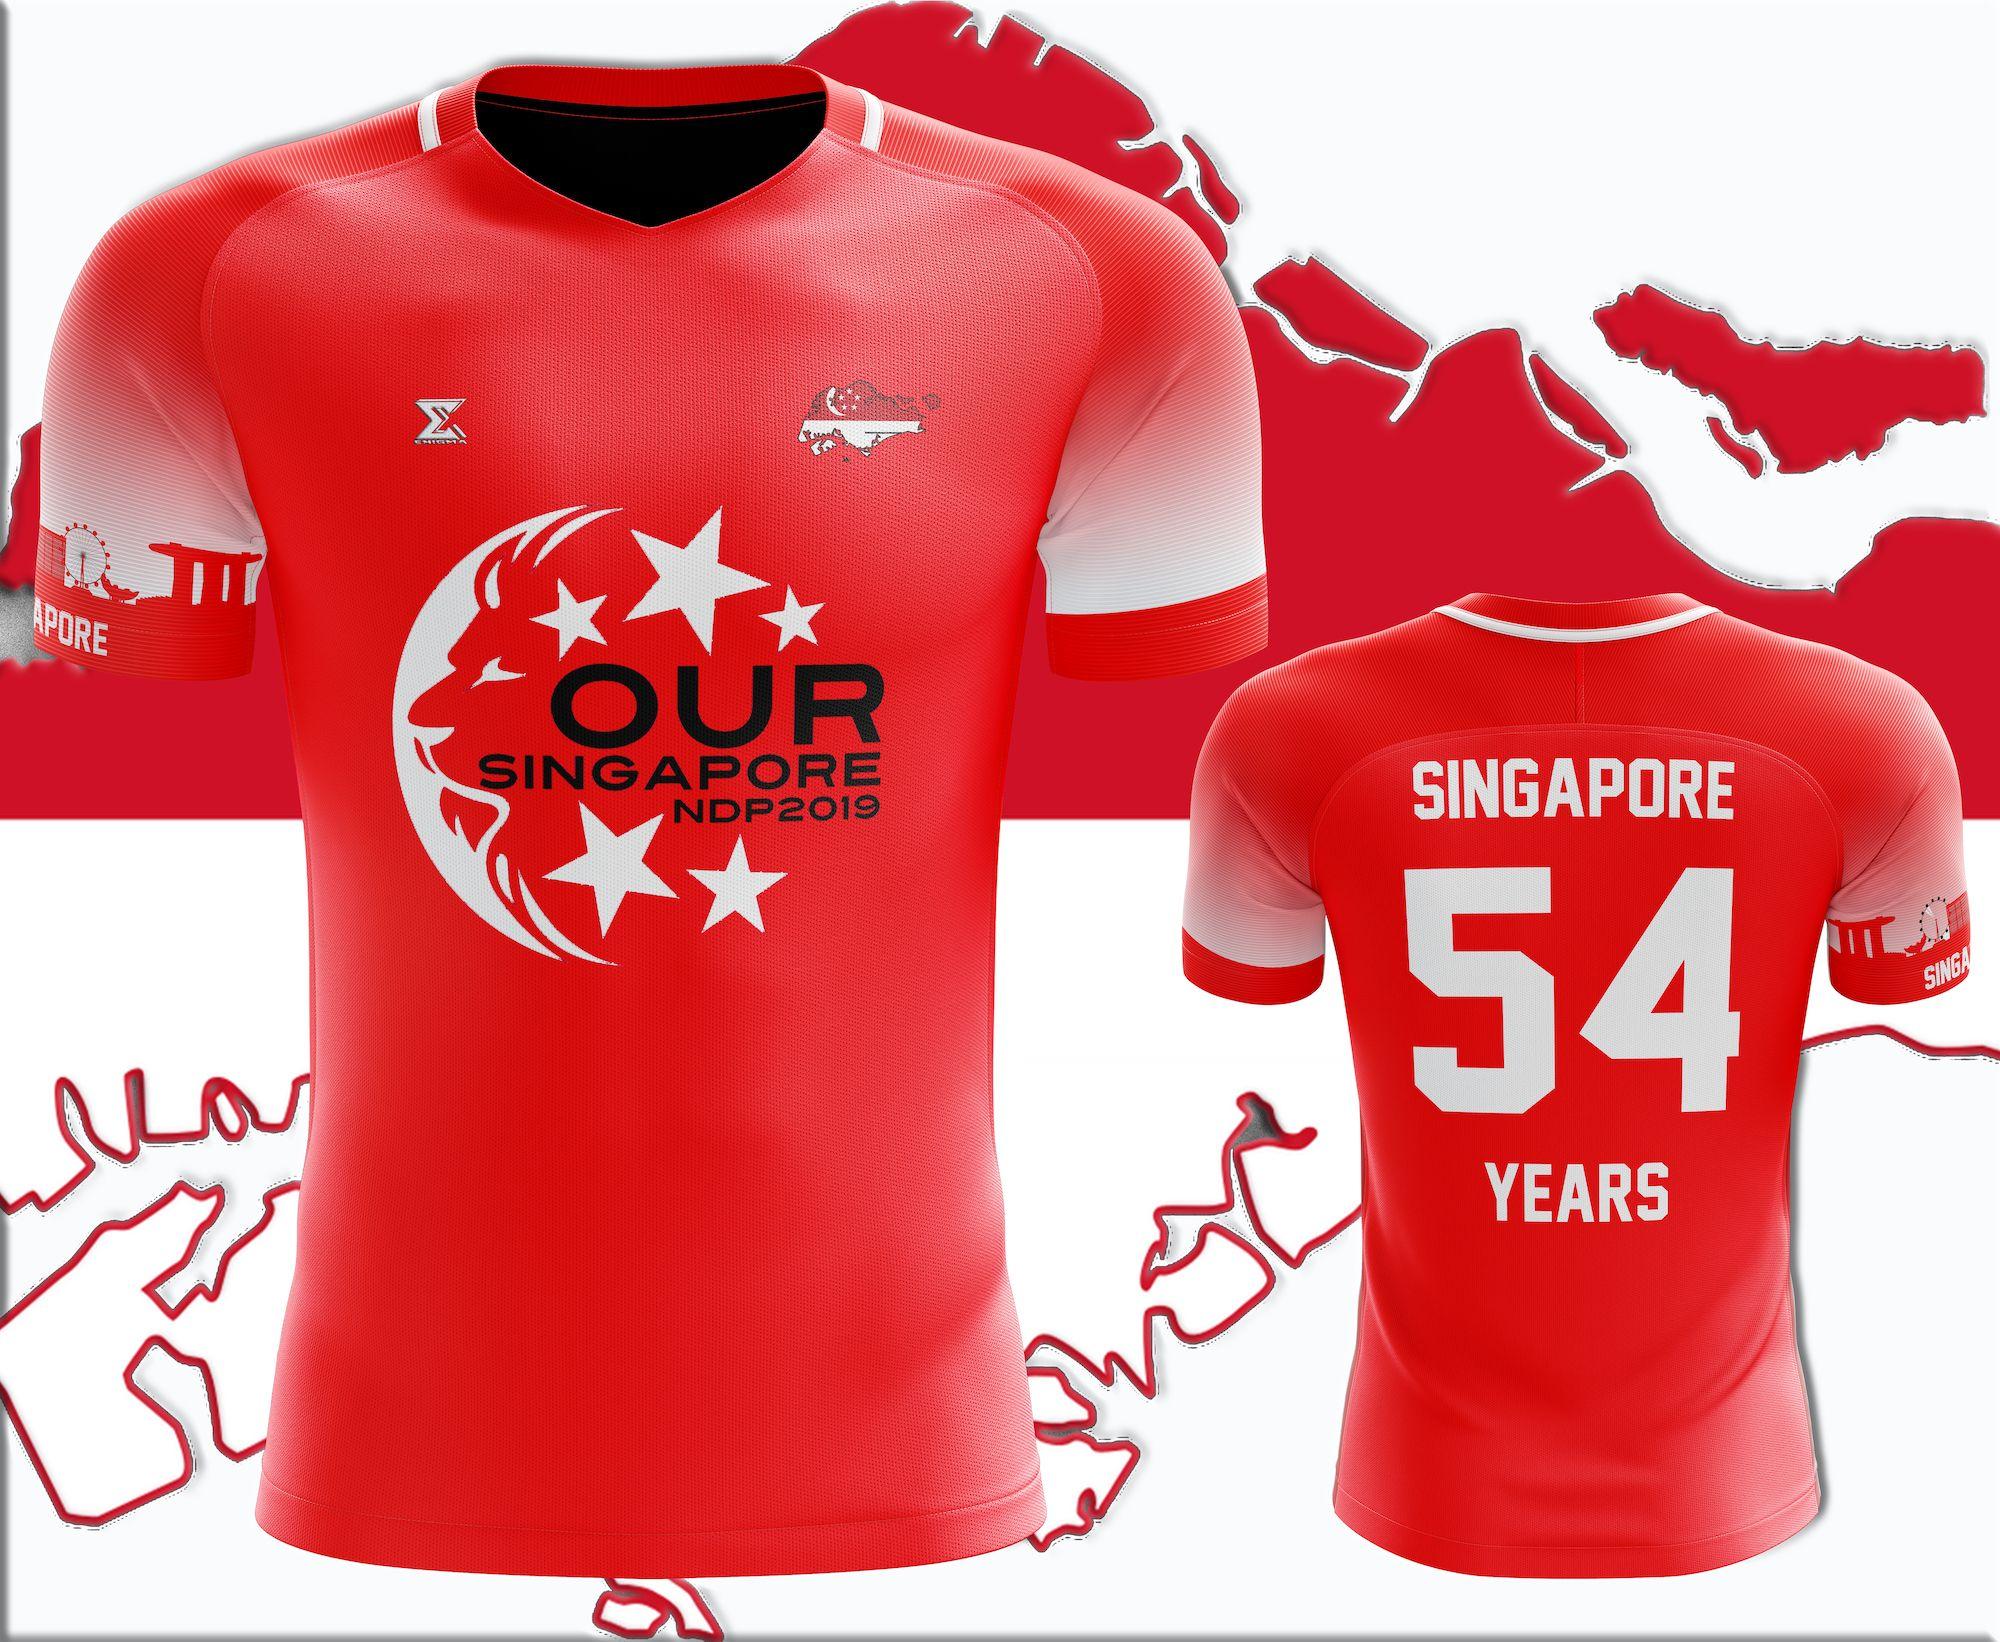 Sg54 Concept Kit In 2020 Sport Outfits Custom Jerseys Design Model